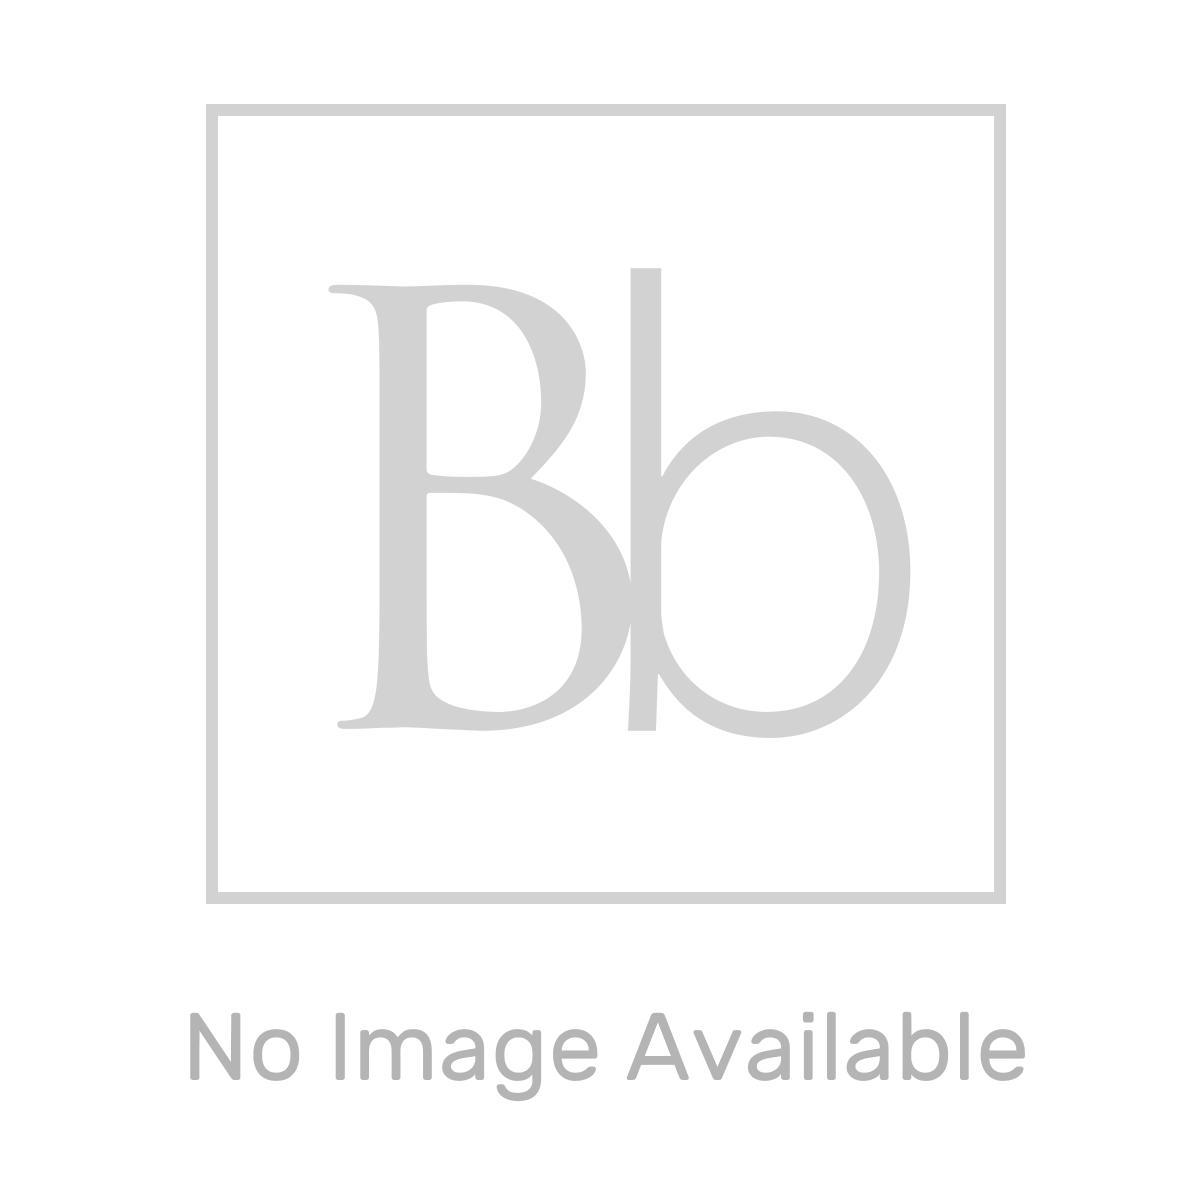 Bathrooms To Love Vema Plavis Chrome ABS Shower Riser Rail Kit with Handset